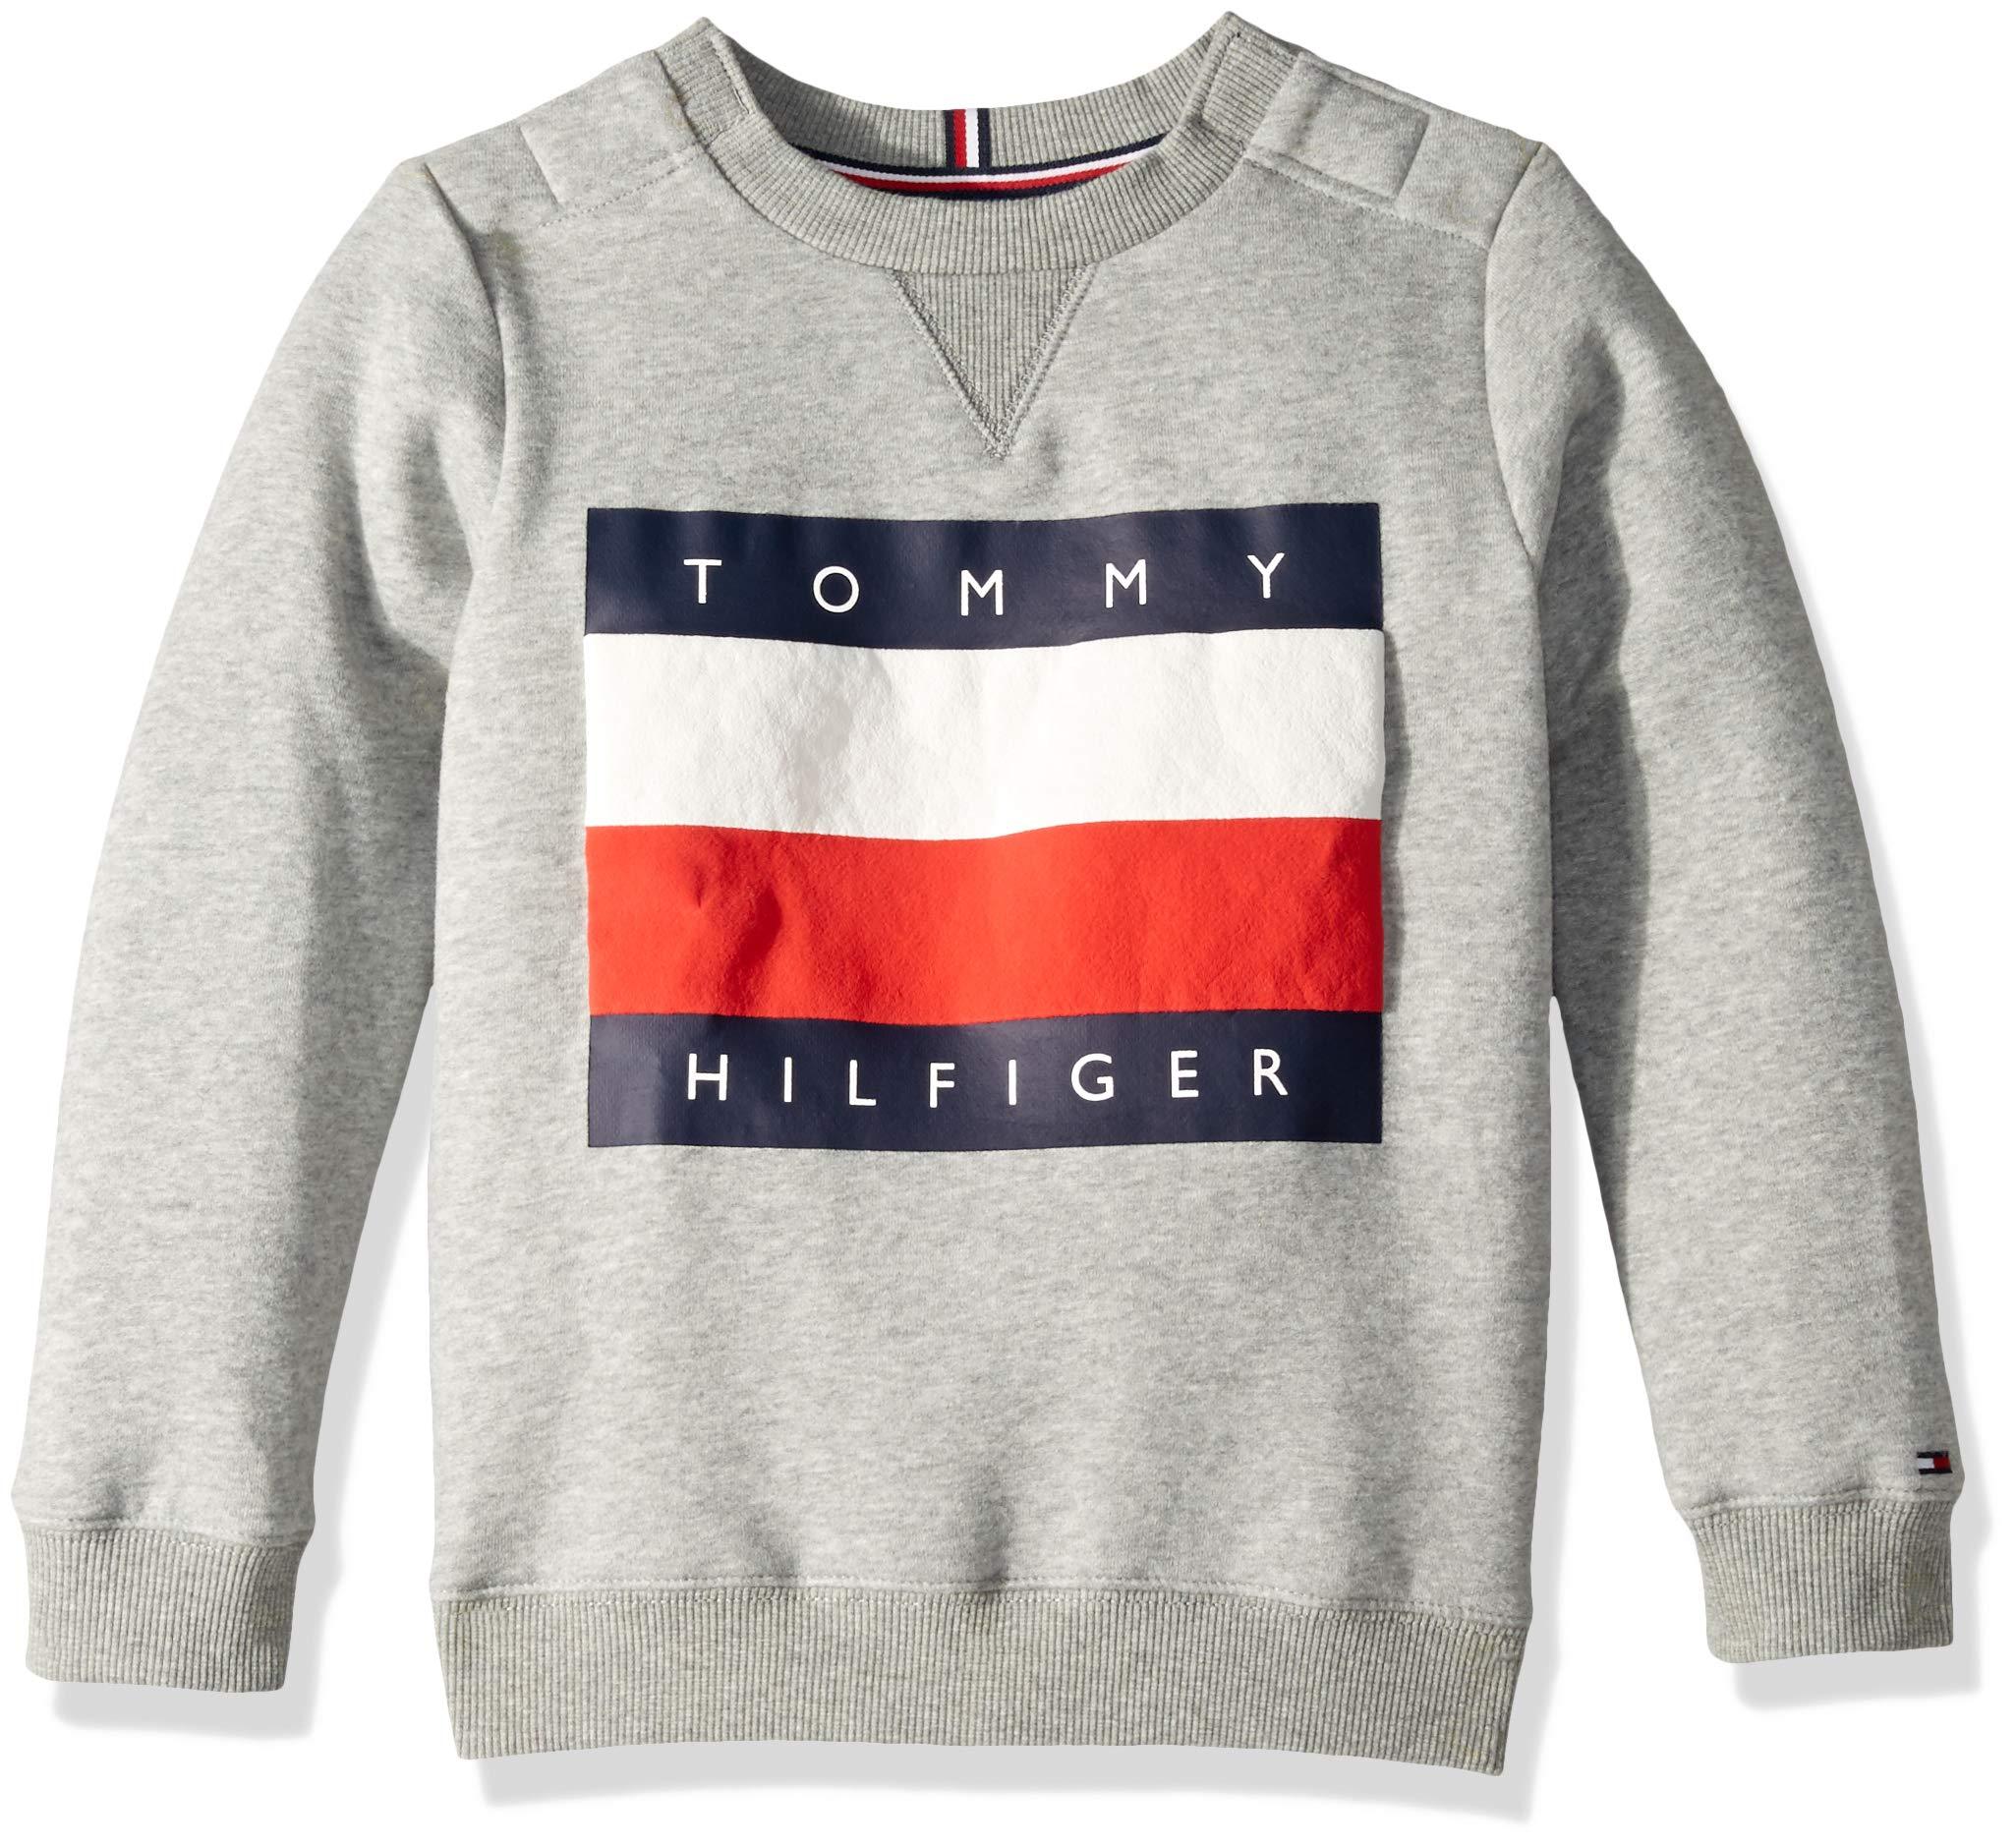 Tommy Hilfiger Boys' Adaptive Sweatshirt with Velcro Brand Closures at Shoulder, Sport Grey Heather LG